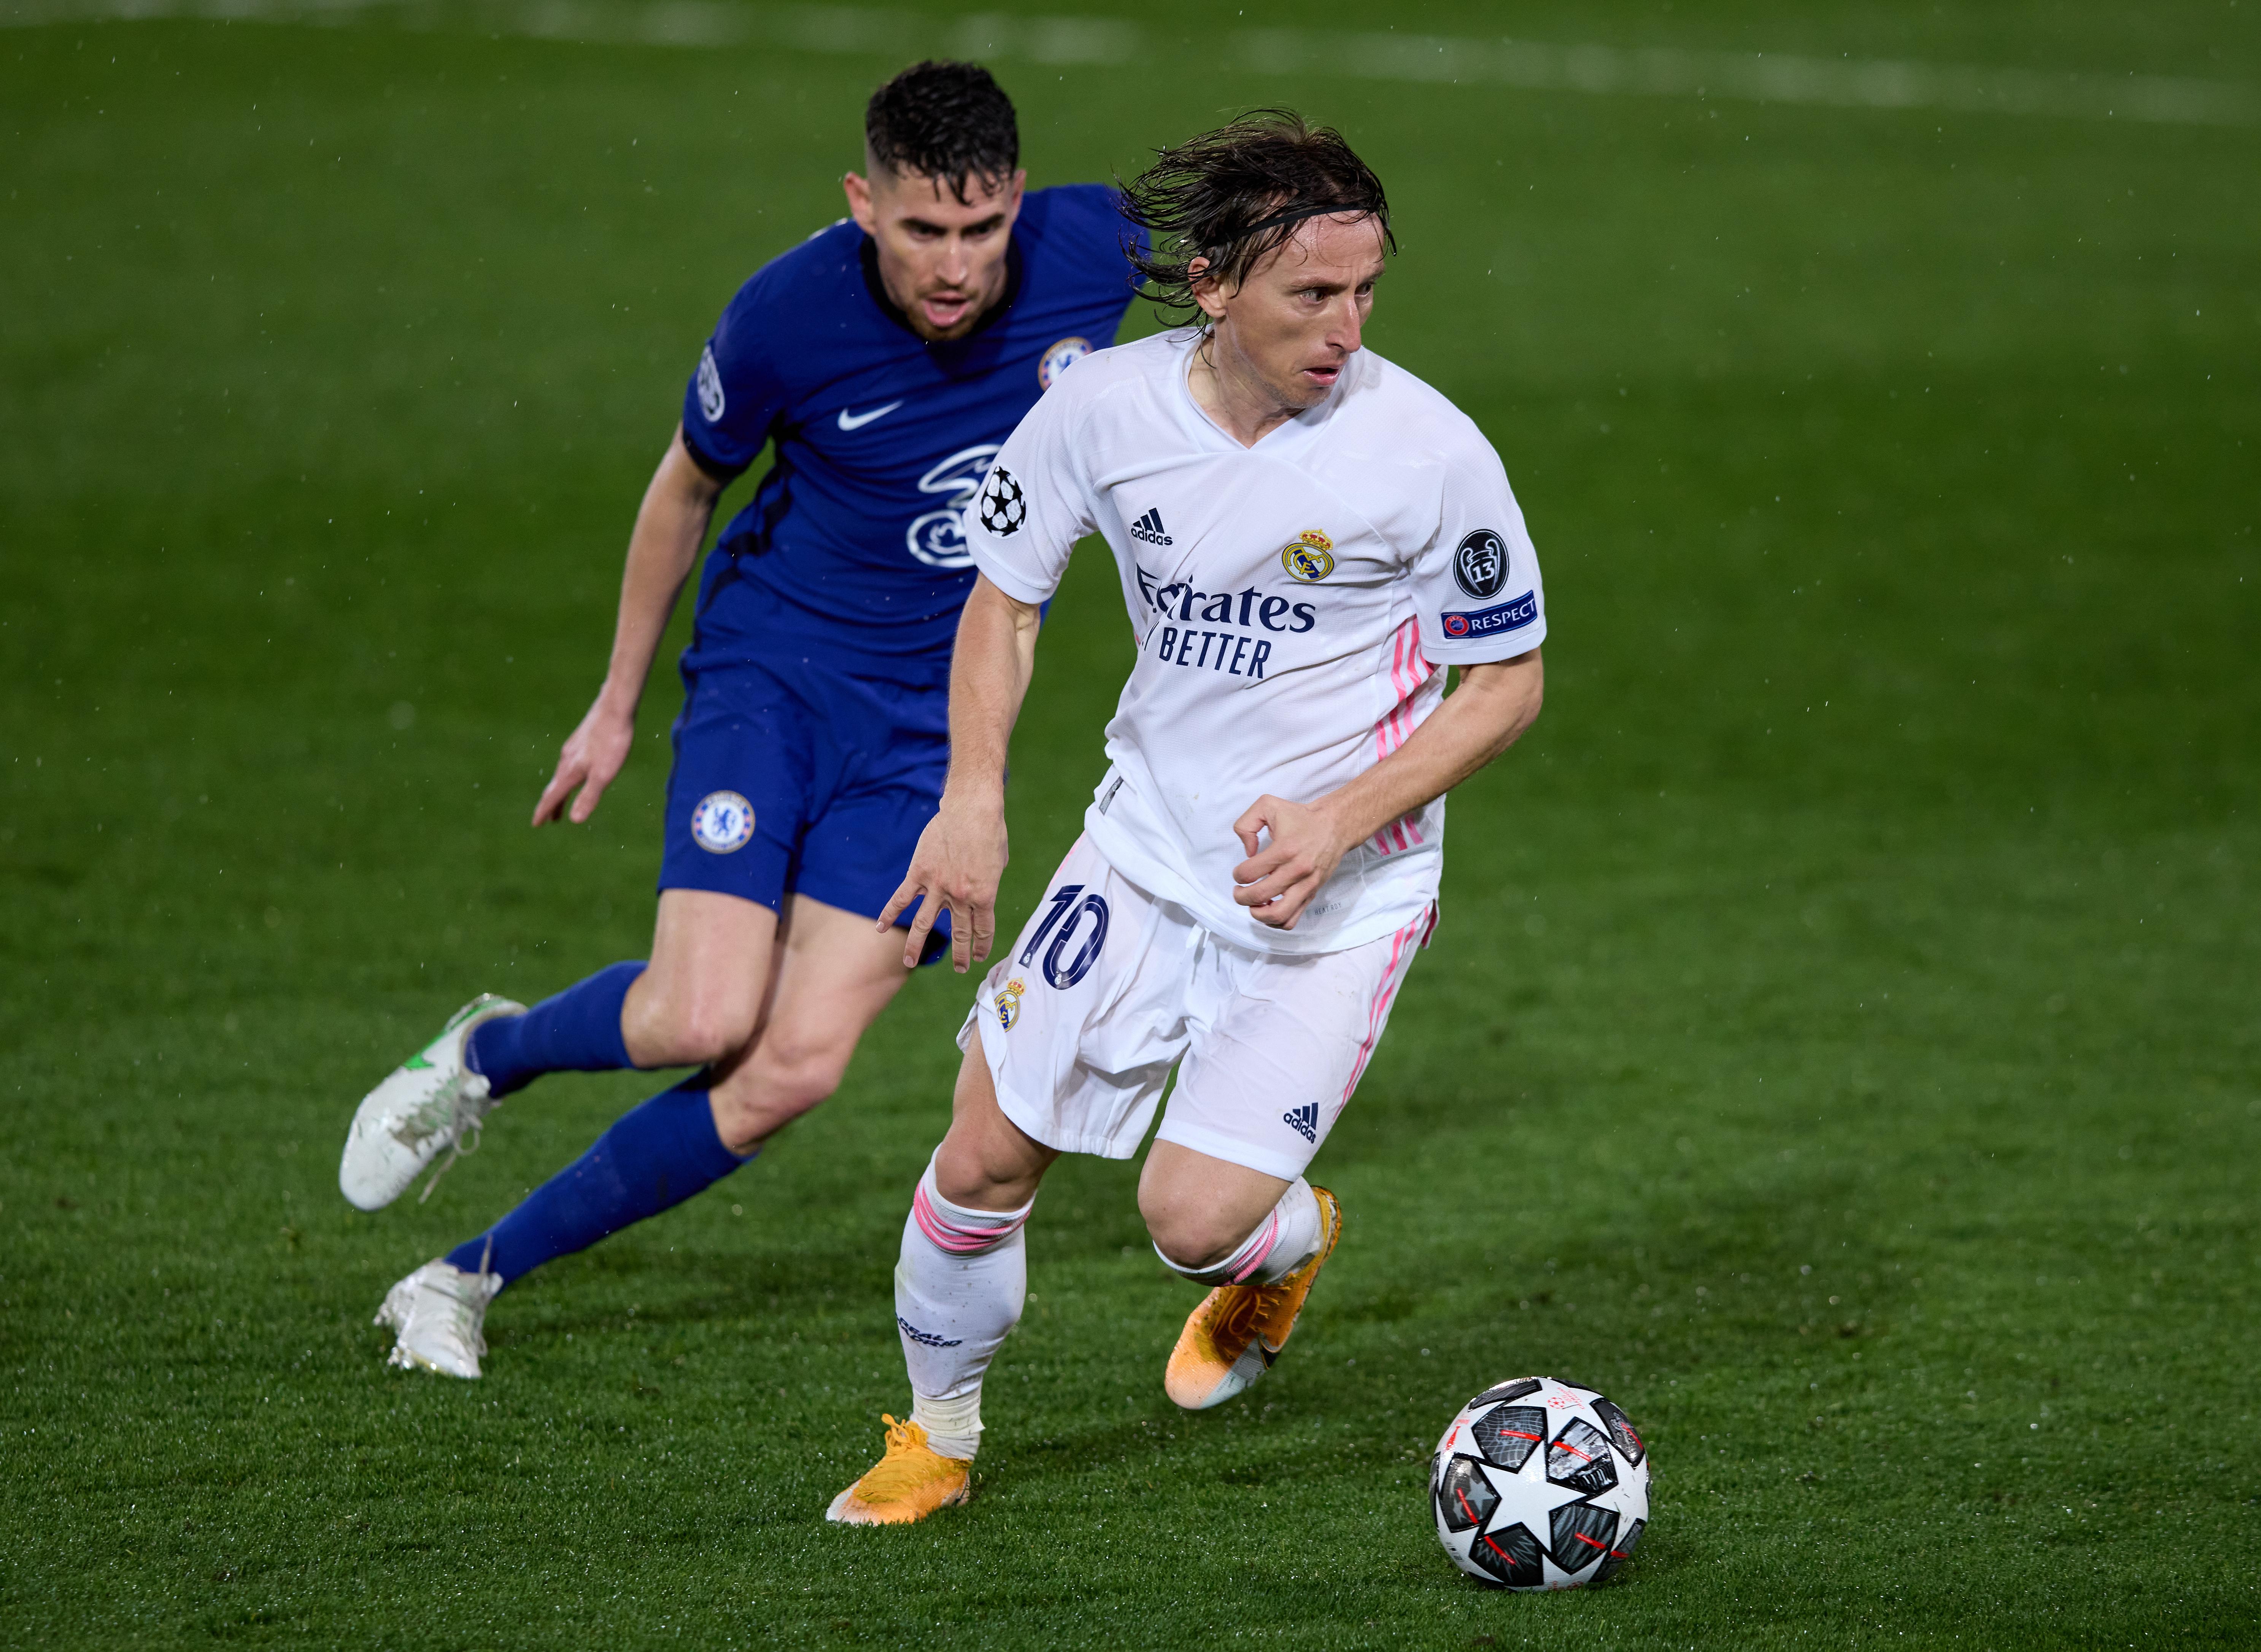 Luka Modric is challenged by Jorginho - Real Madrid v Chelsea - UEFA Champions League Semifinal